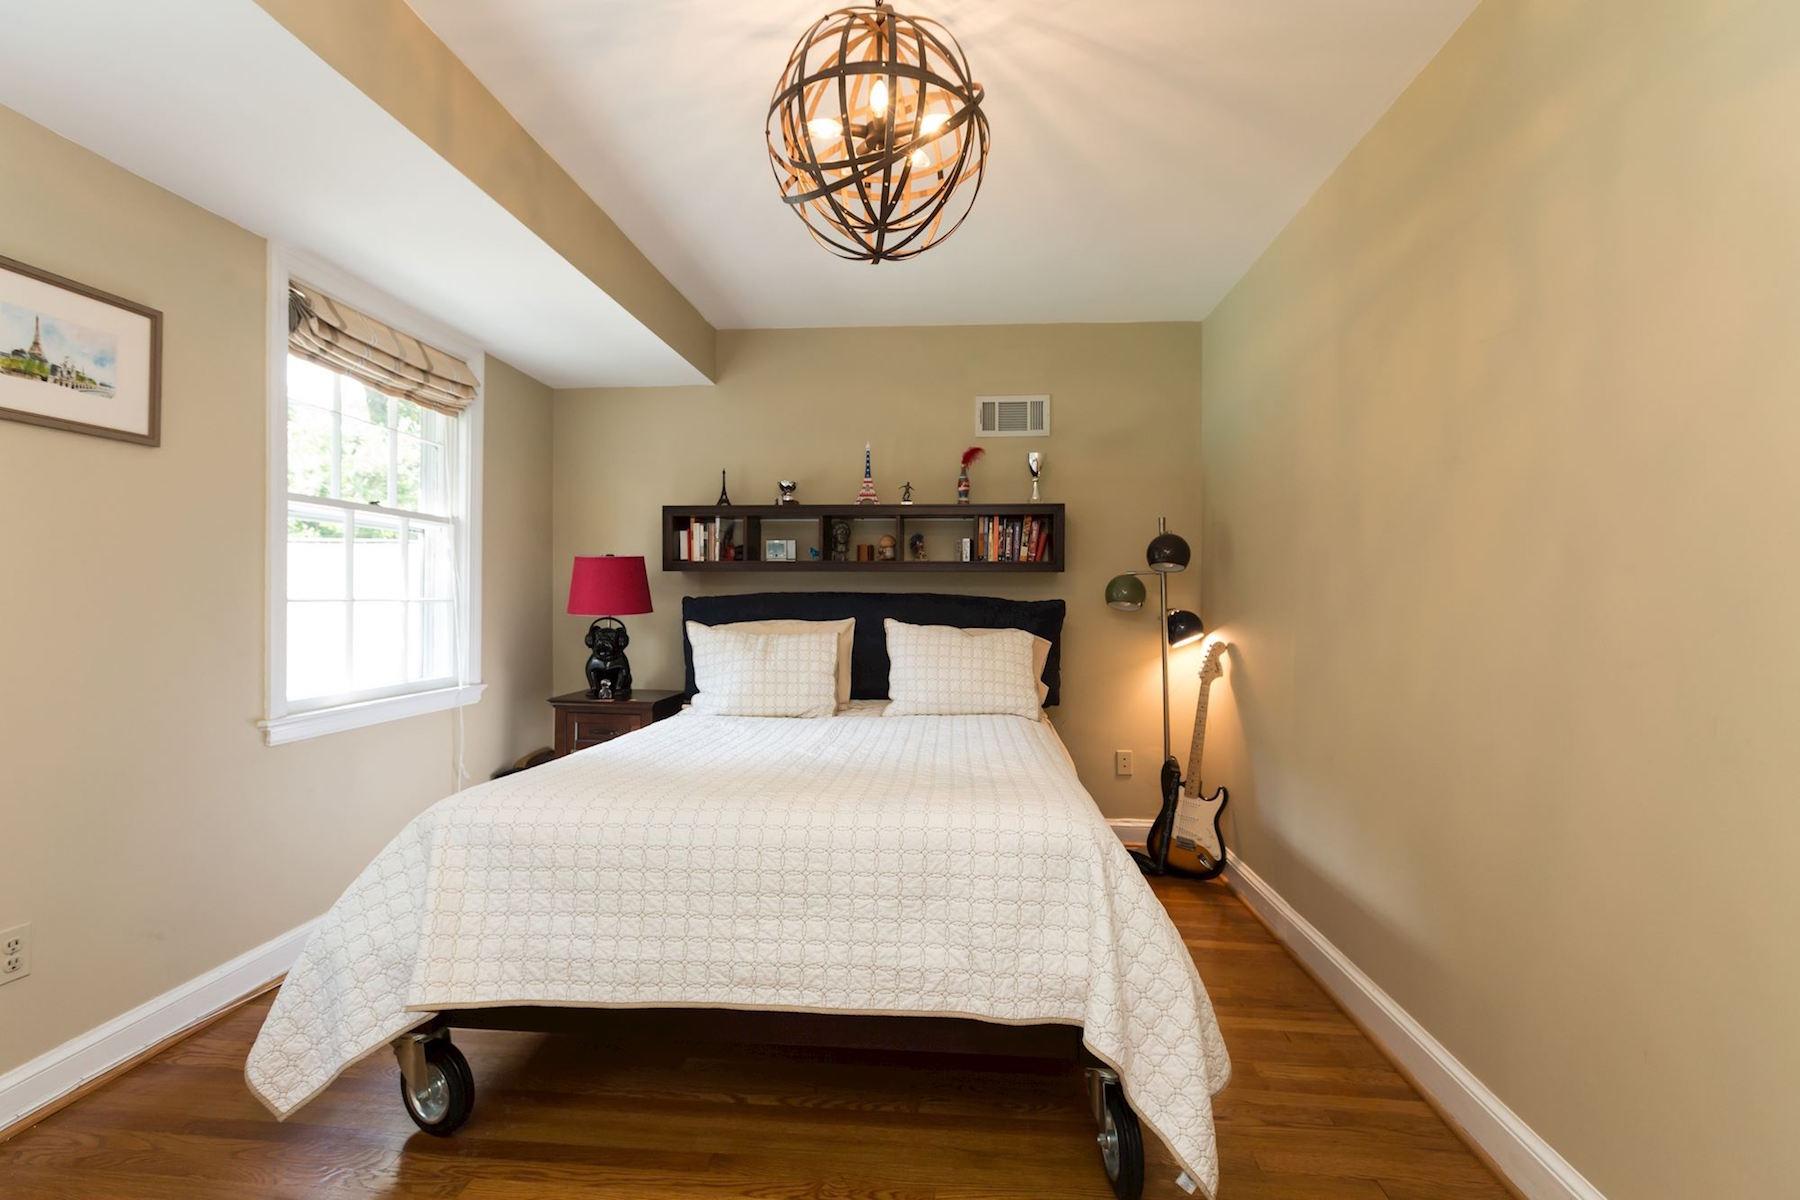 Additional photo for property listing at 5153 Tilden Street 5153 Tilden Street Nw Washington, Περιφερεια Τησ Κολουμπια 20016 Ηνωμενεσ Πολιτειεσ